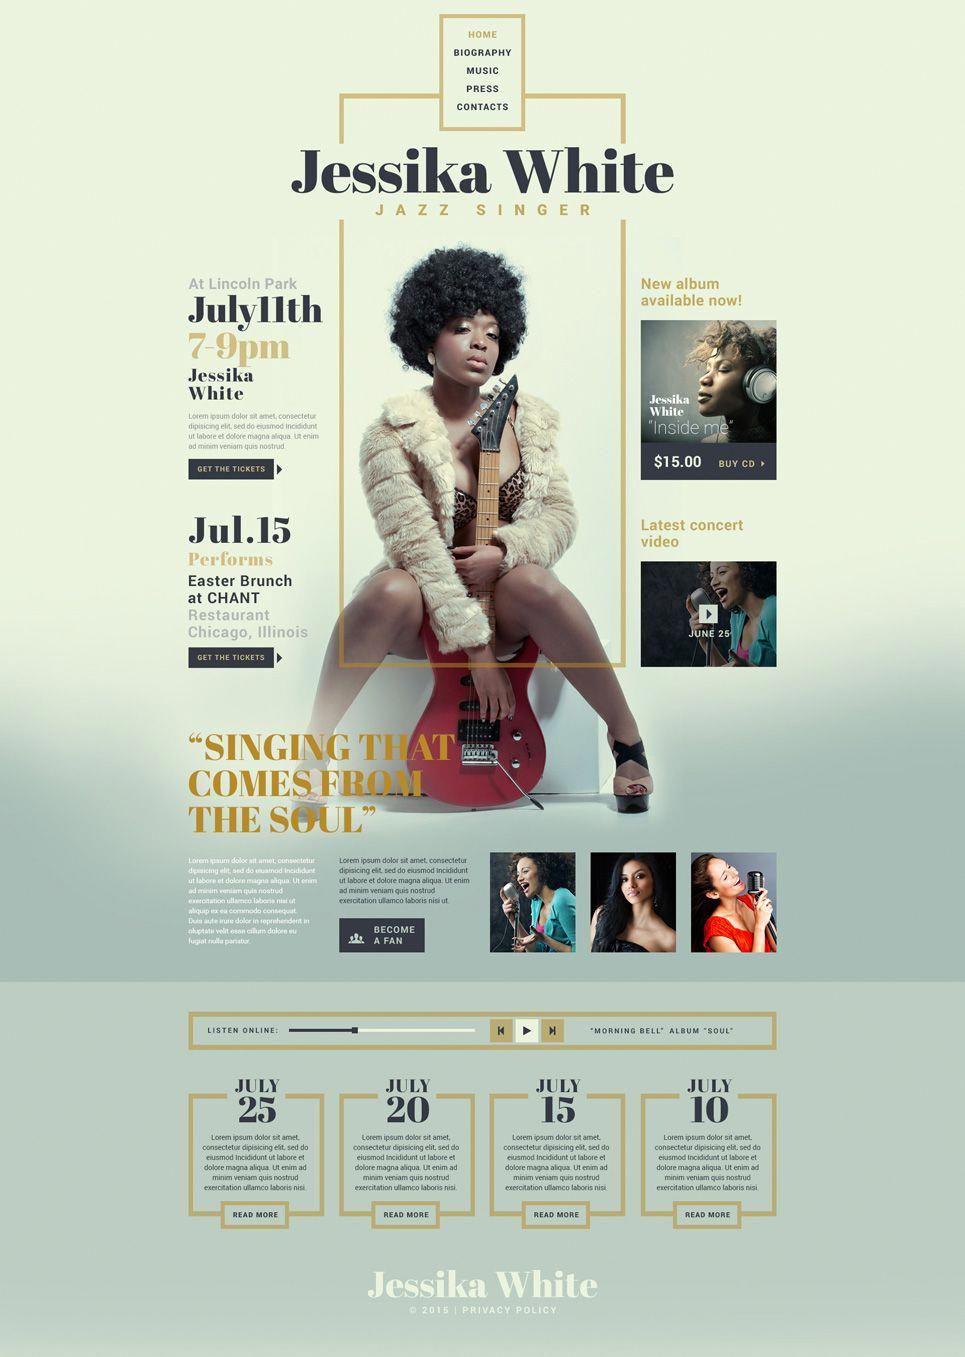 Epingle Sur Web Design And Marketing